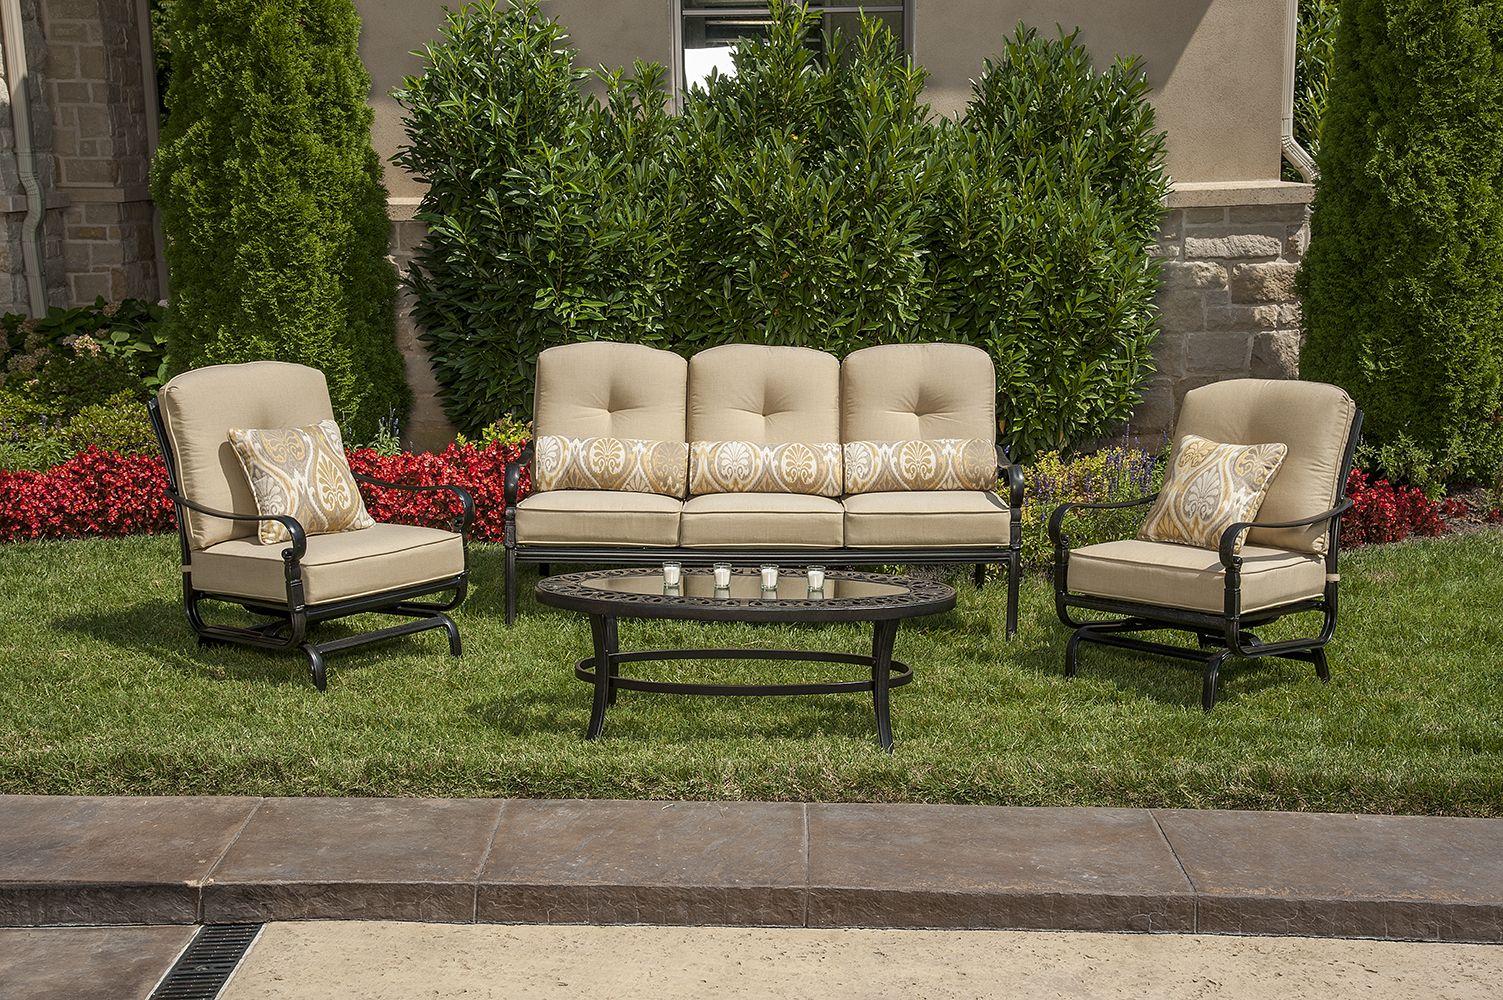 LaZBoy Outdoor's Amelia seating set Sam's Club 2014